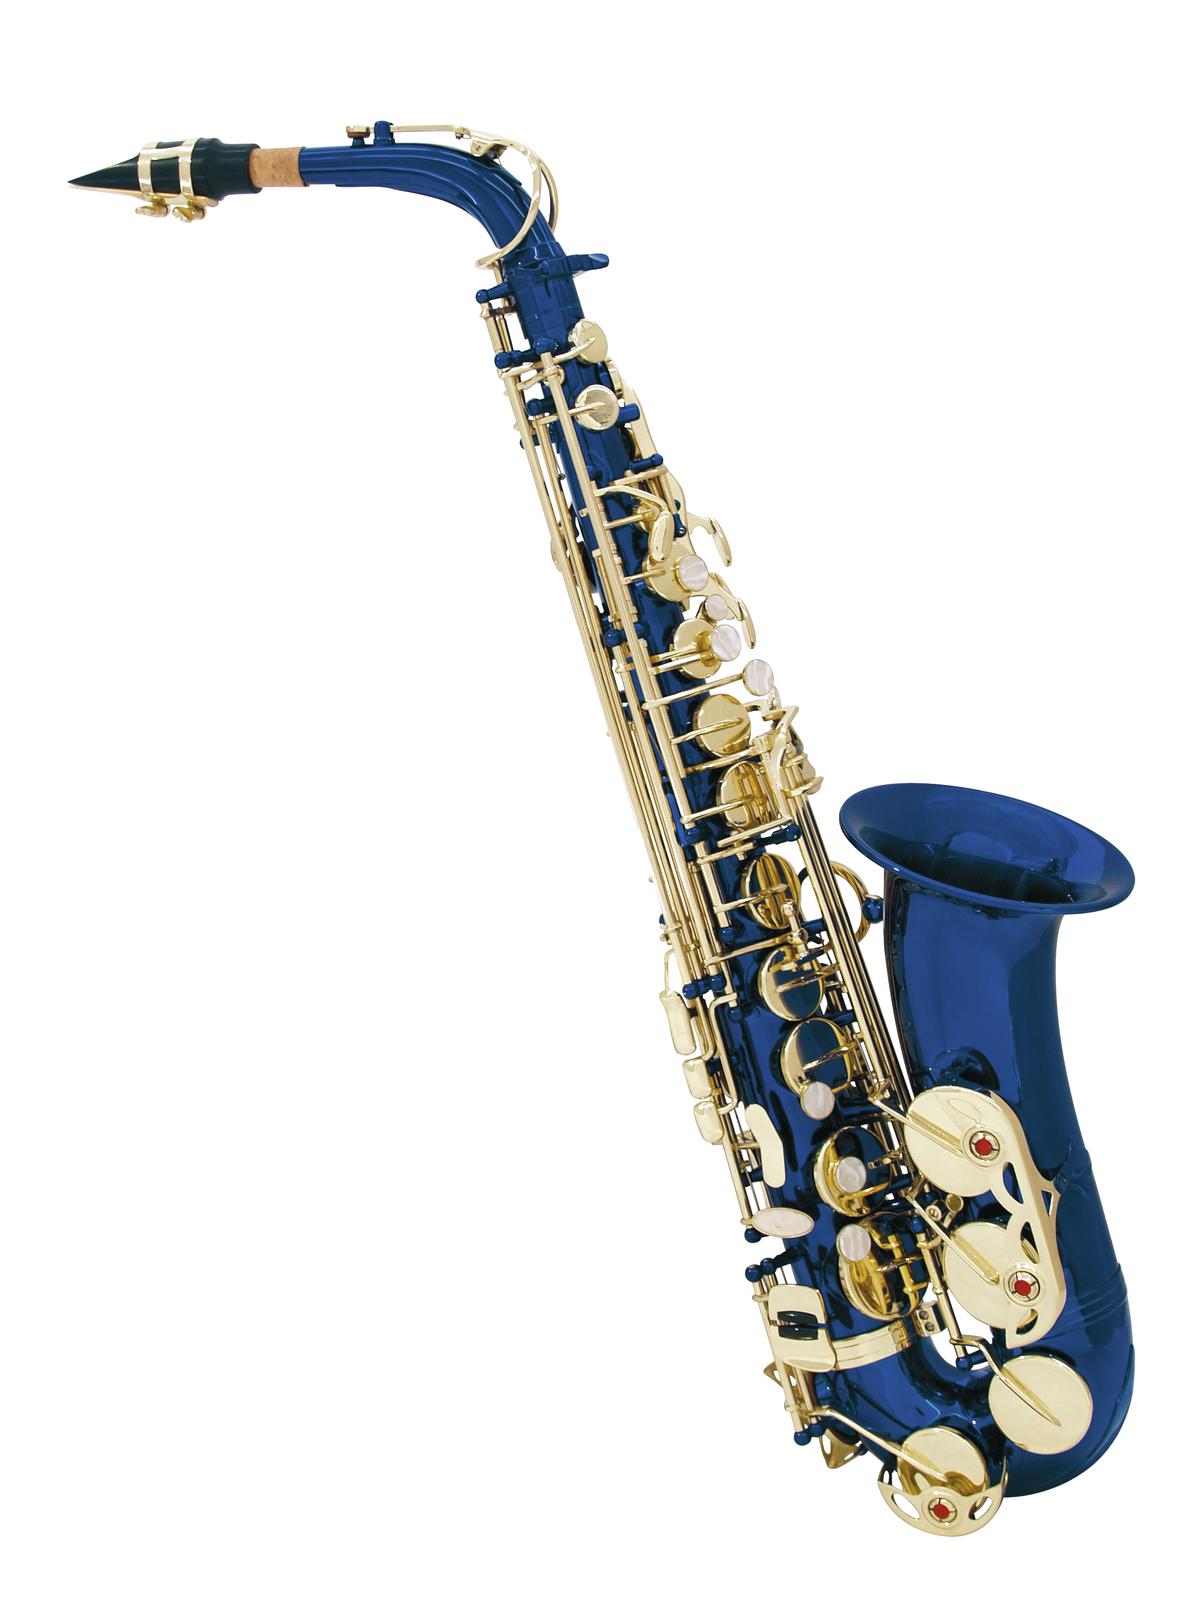 DIMAVERY SP-30 Eb Altsaxophon, blau